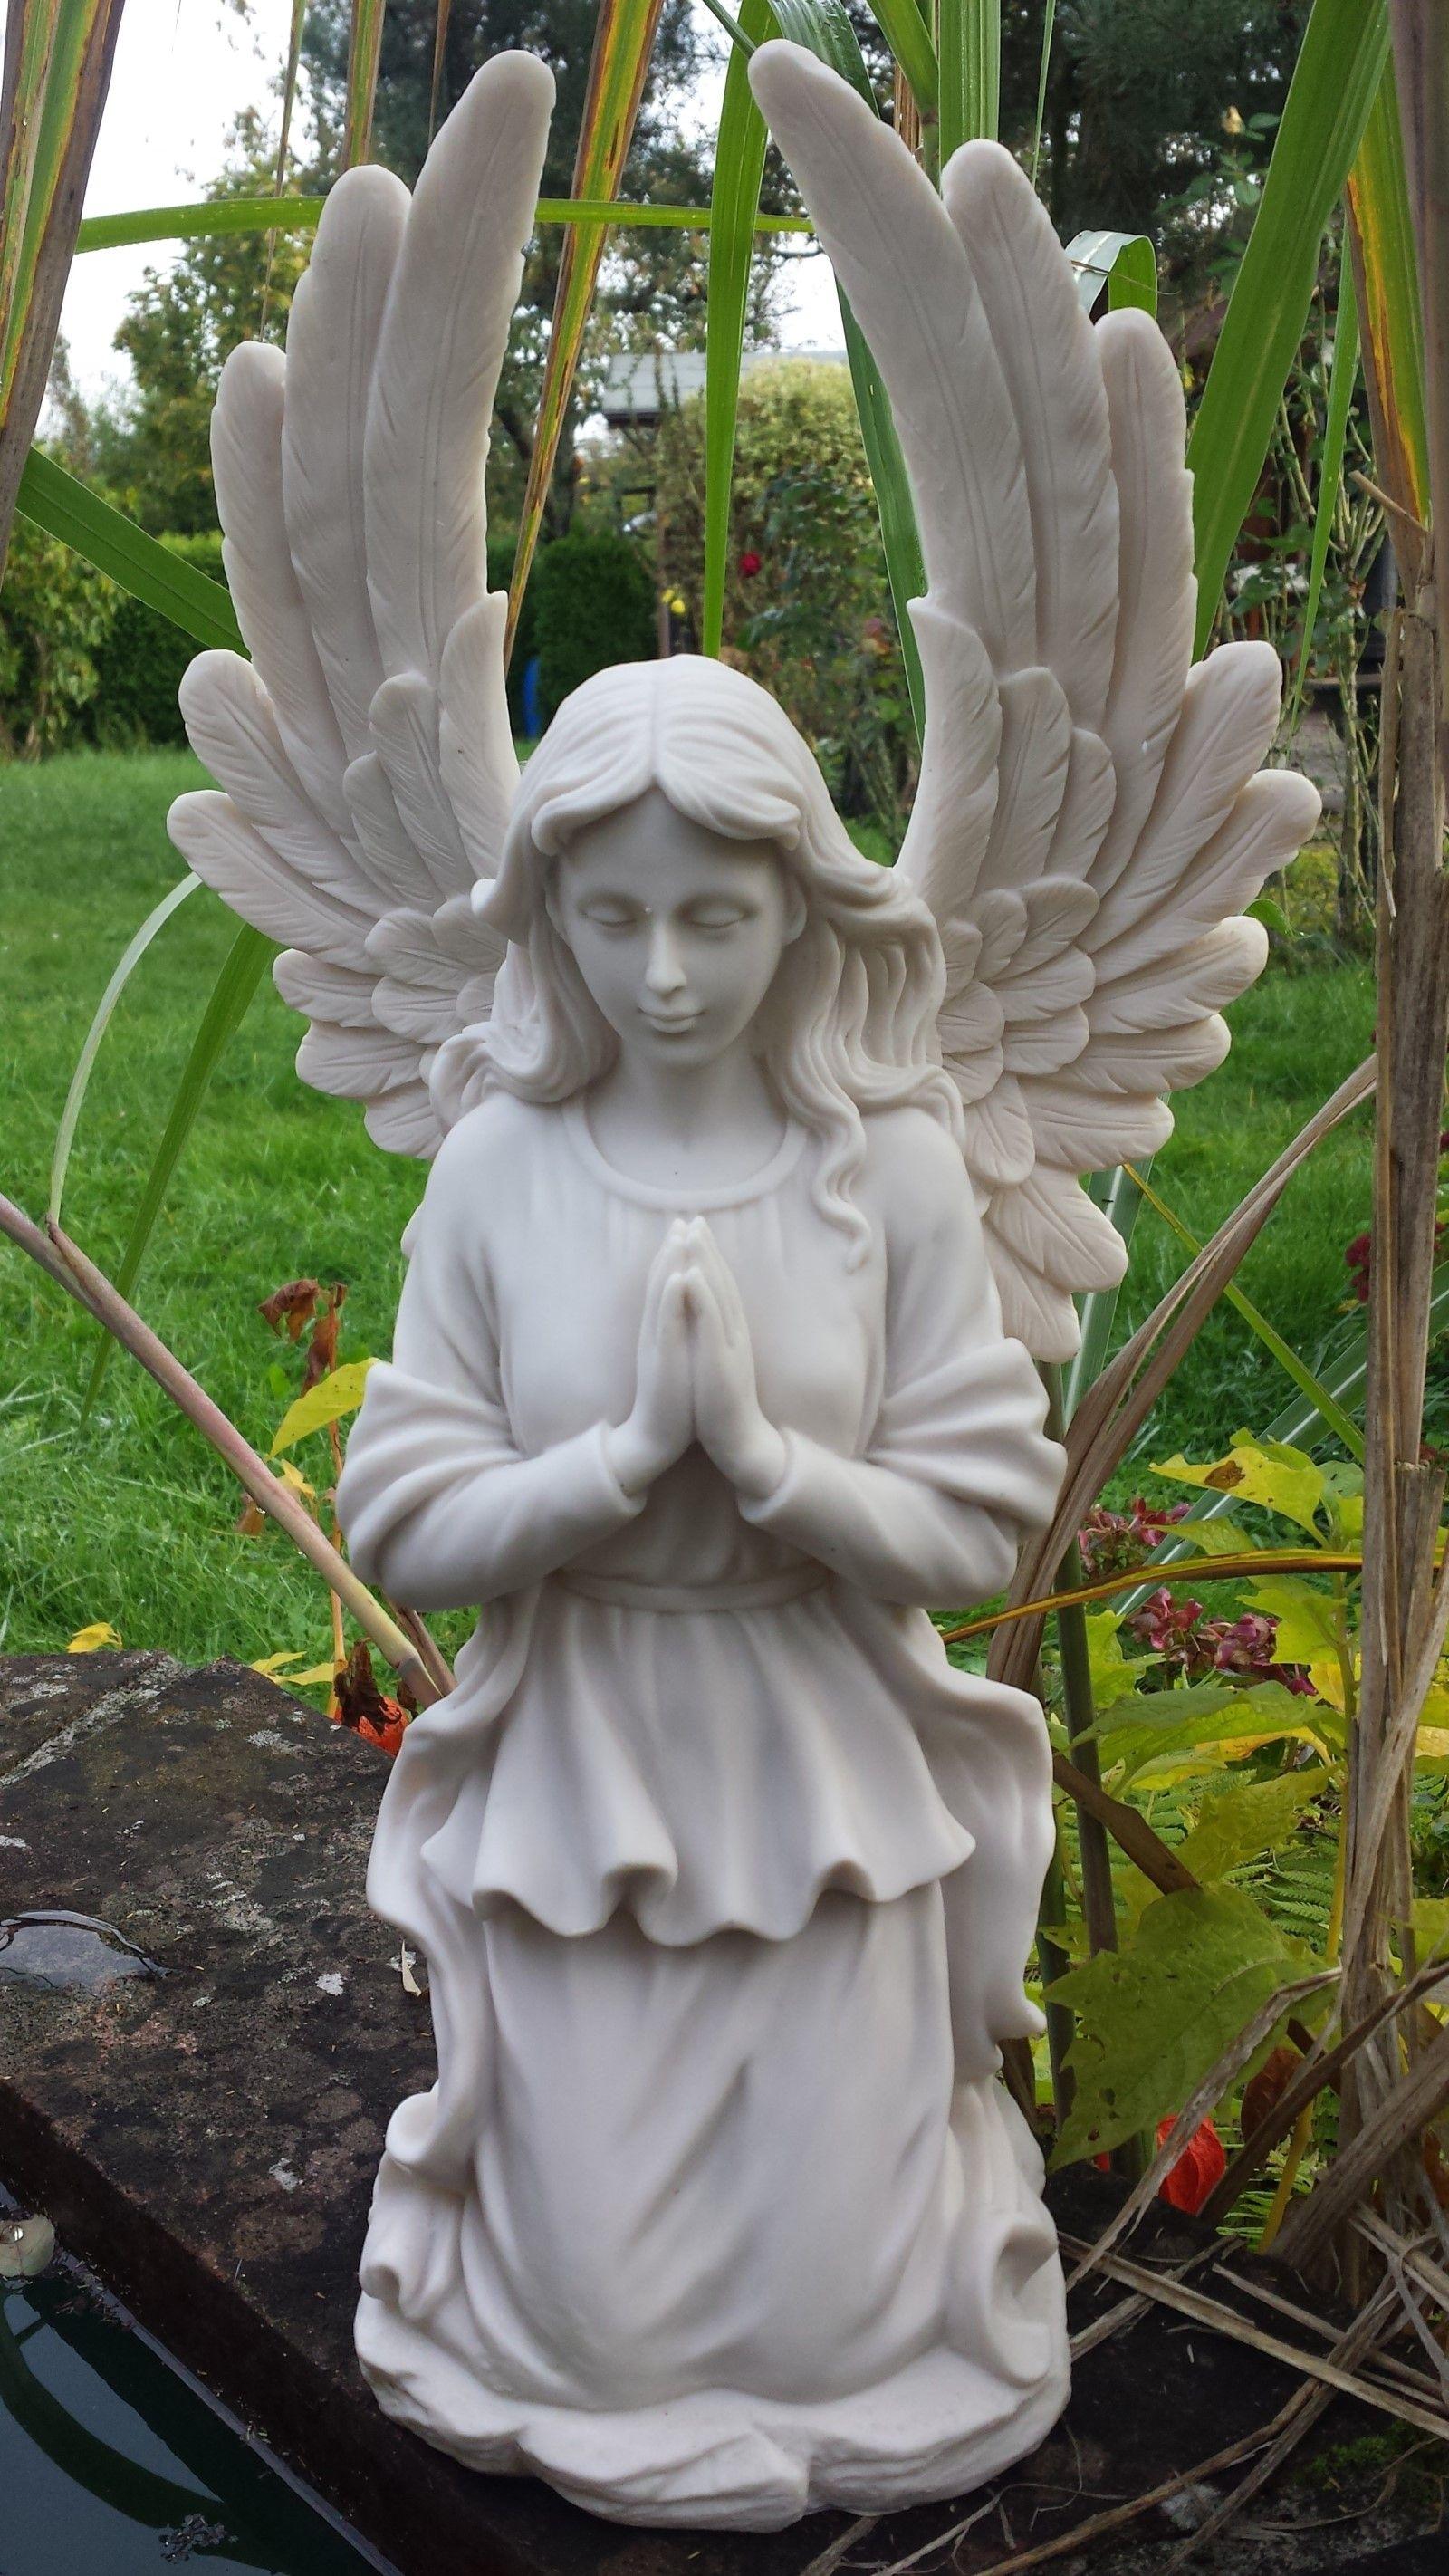 Grosser Betender Engel Knieend Schutzengel Figur Engel Skulptur Engel